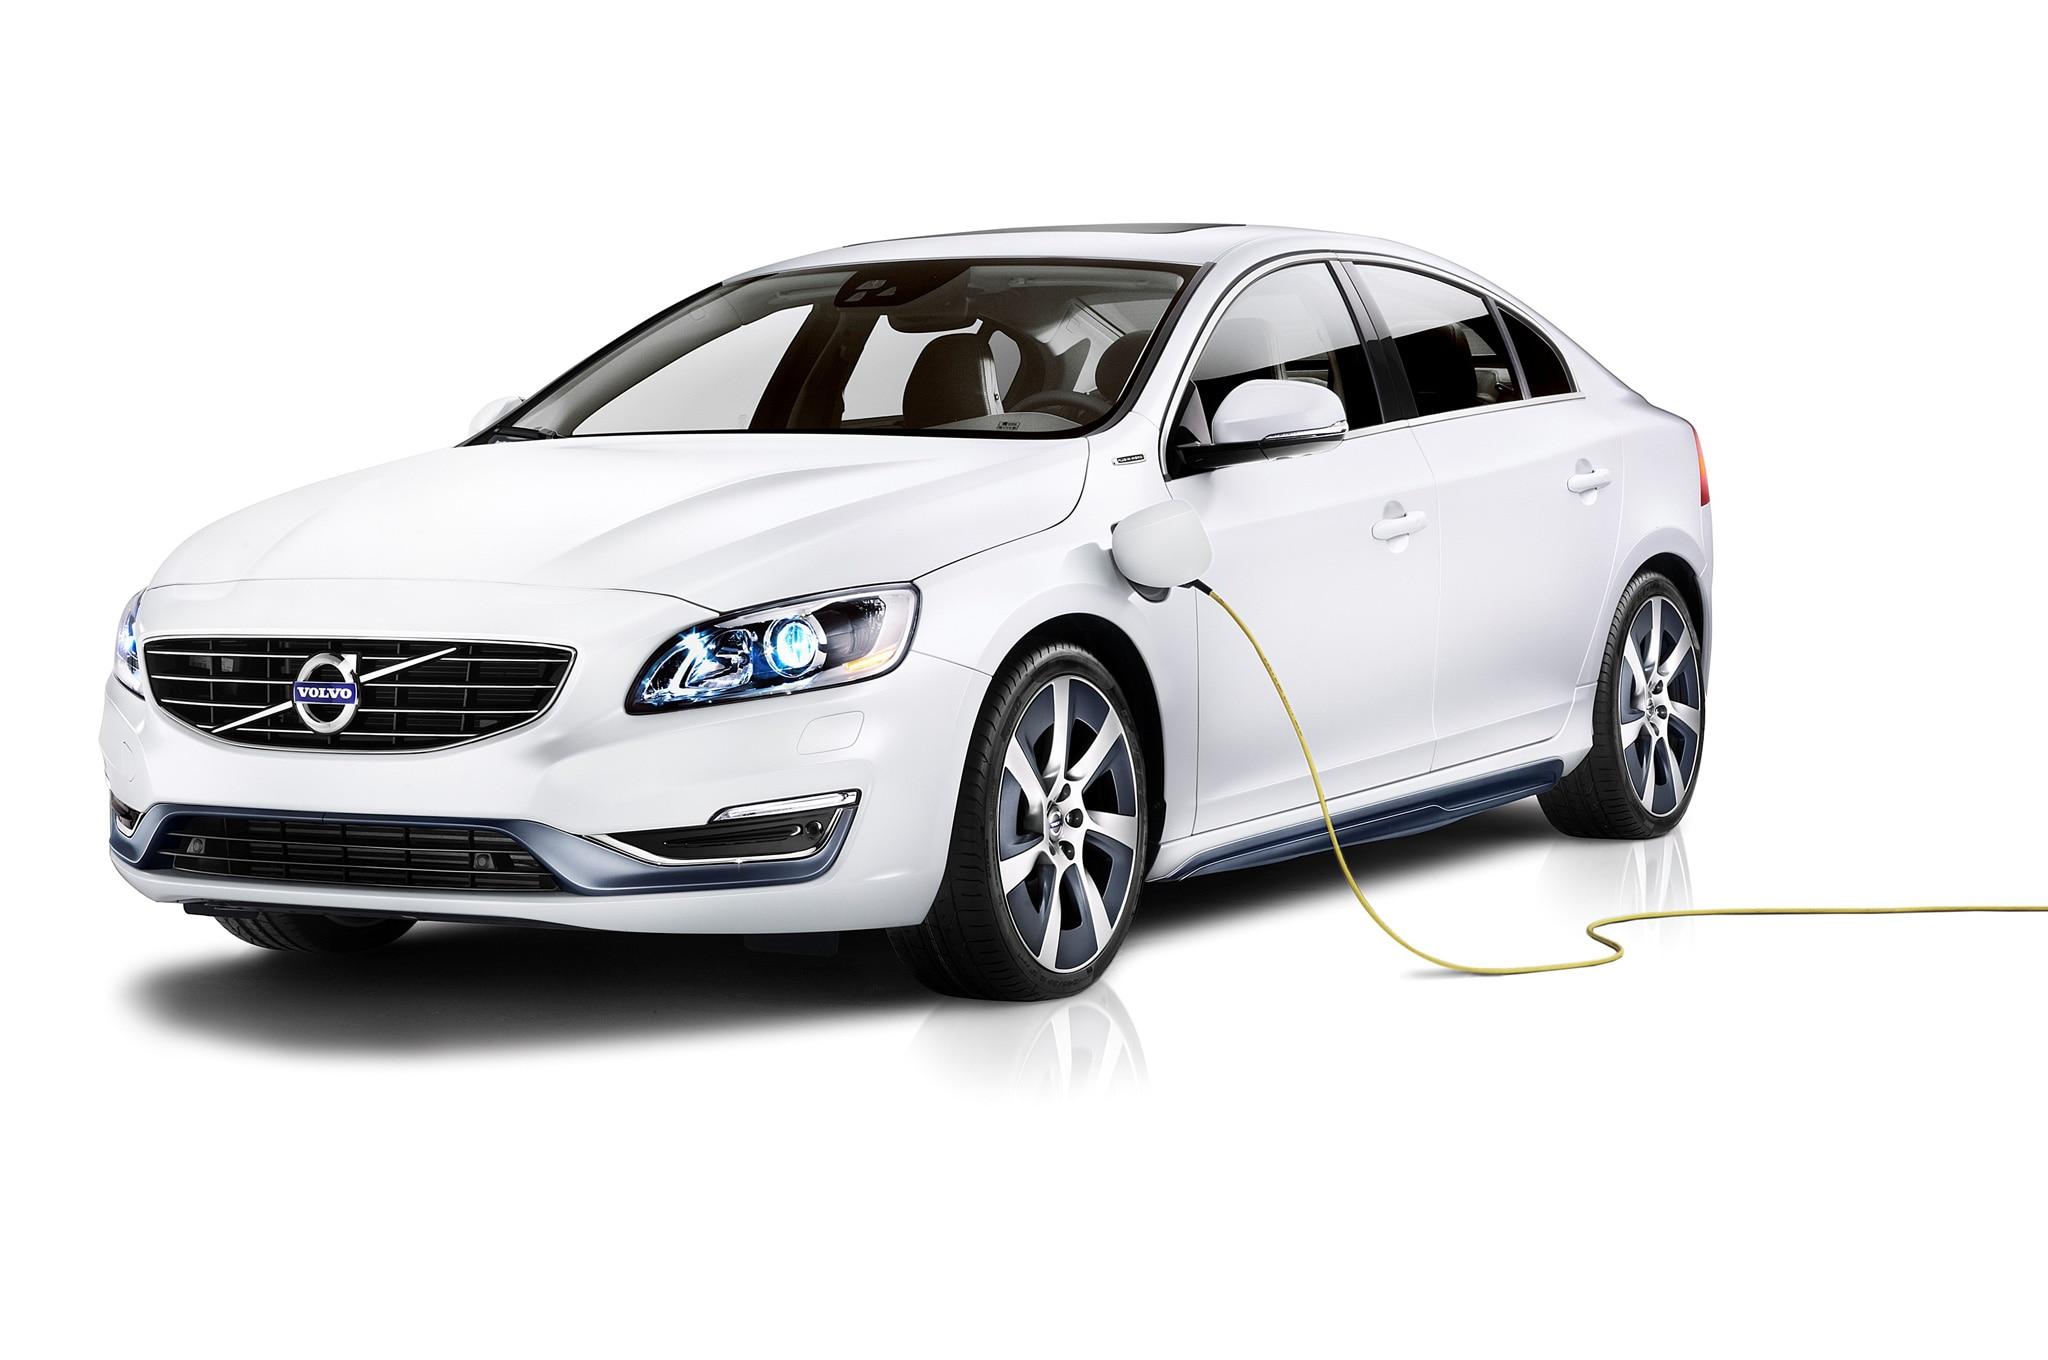 volvo s60l plug-in hybrid shown in beijing - automobile magazine